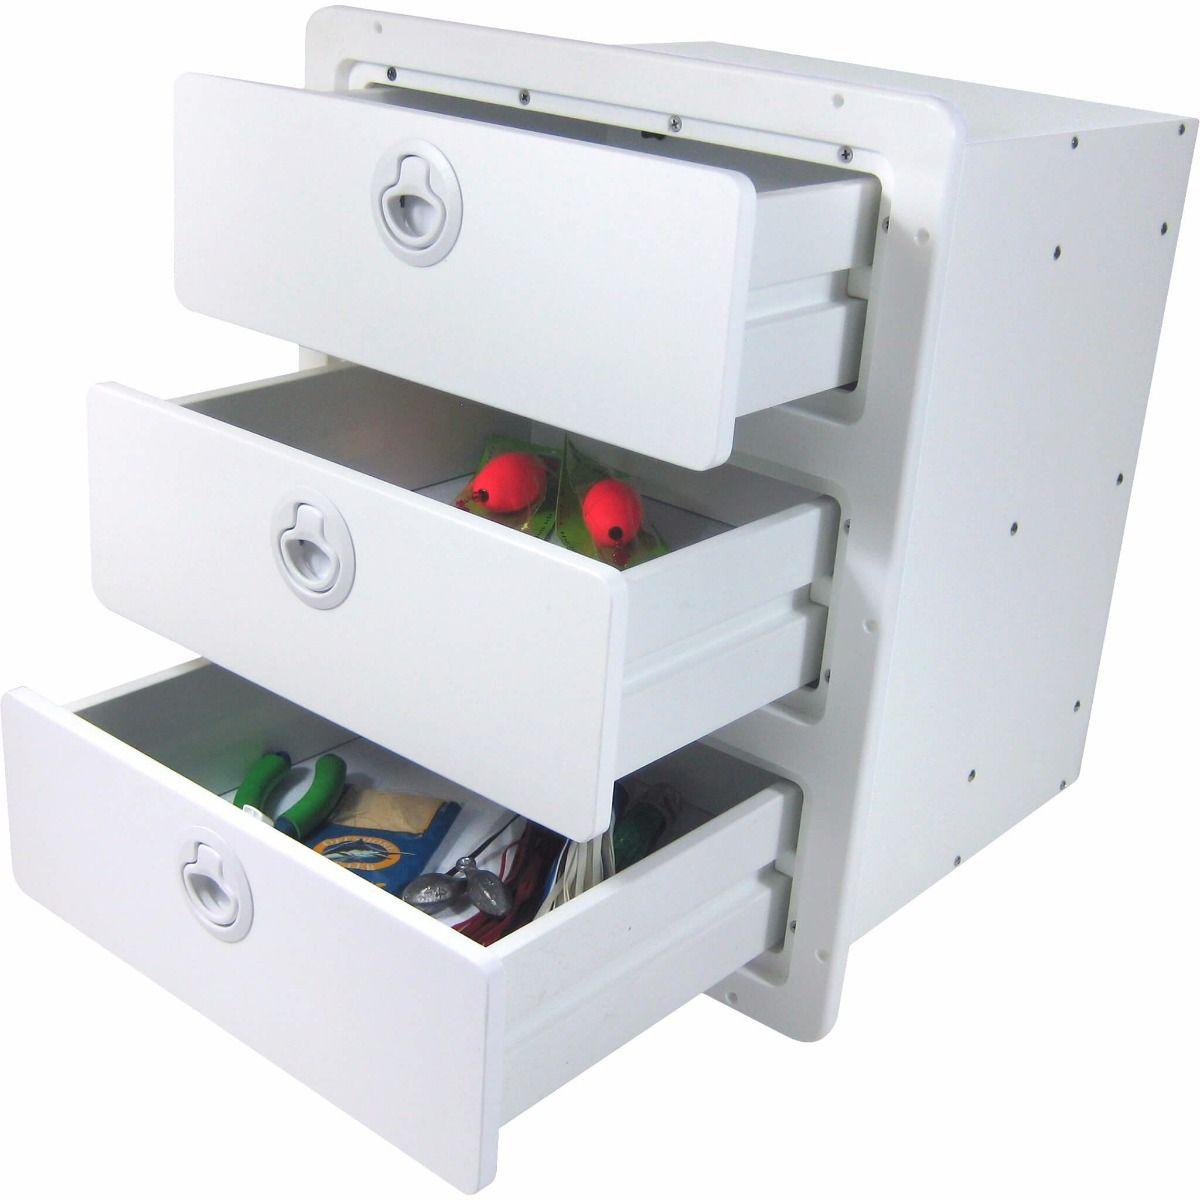 Marine Kitchen Cabinets: Image Result For Marine Cabinets Hardware ALUMINUM EDGING